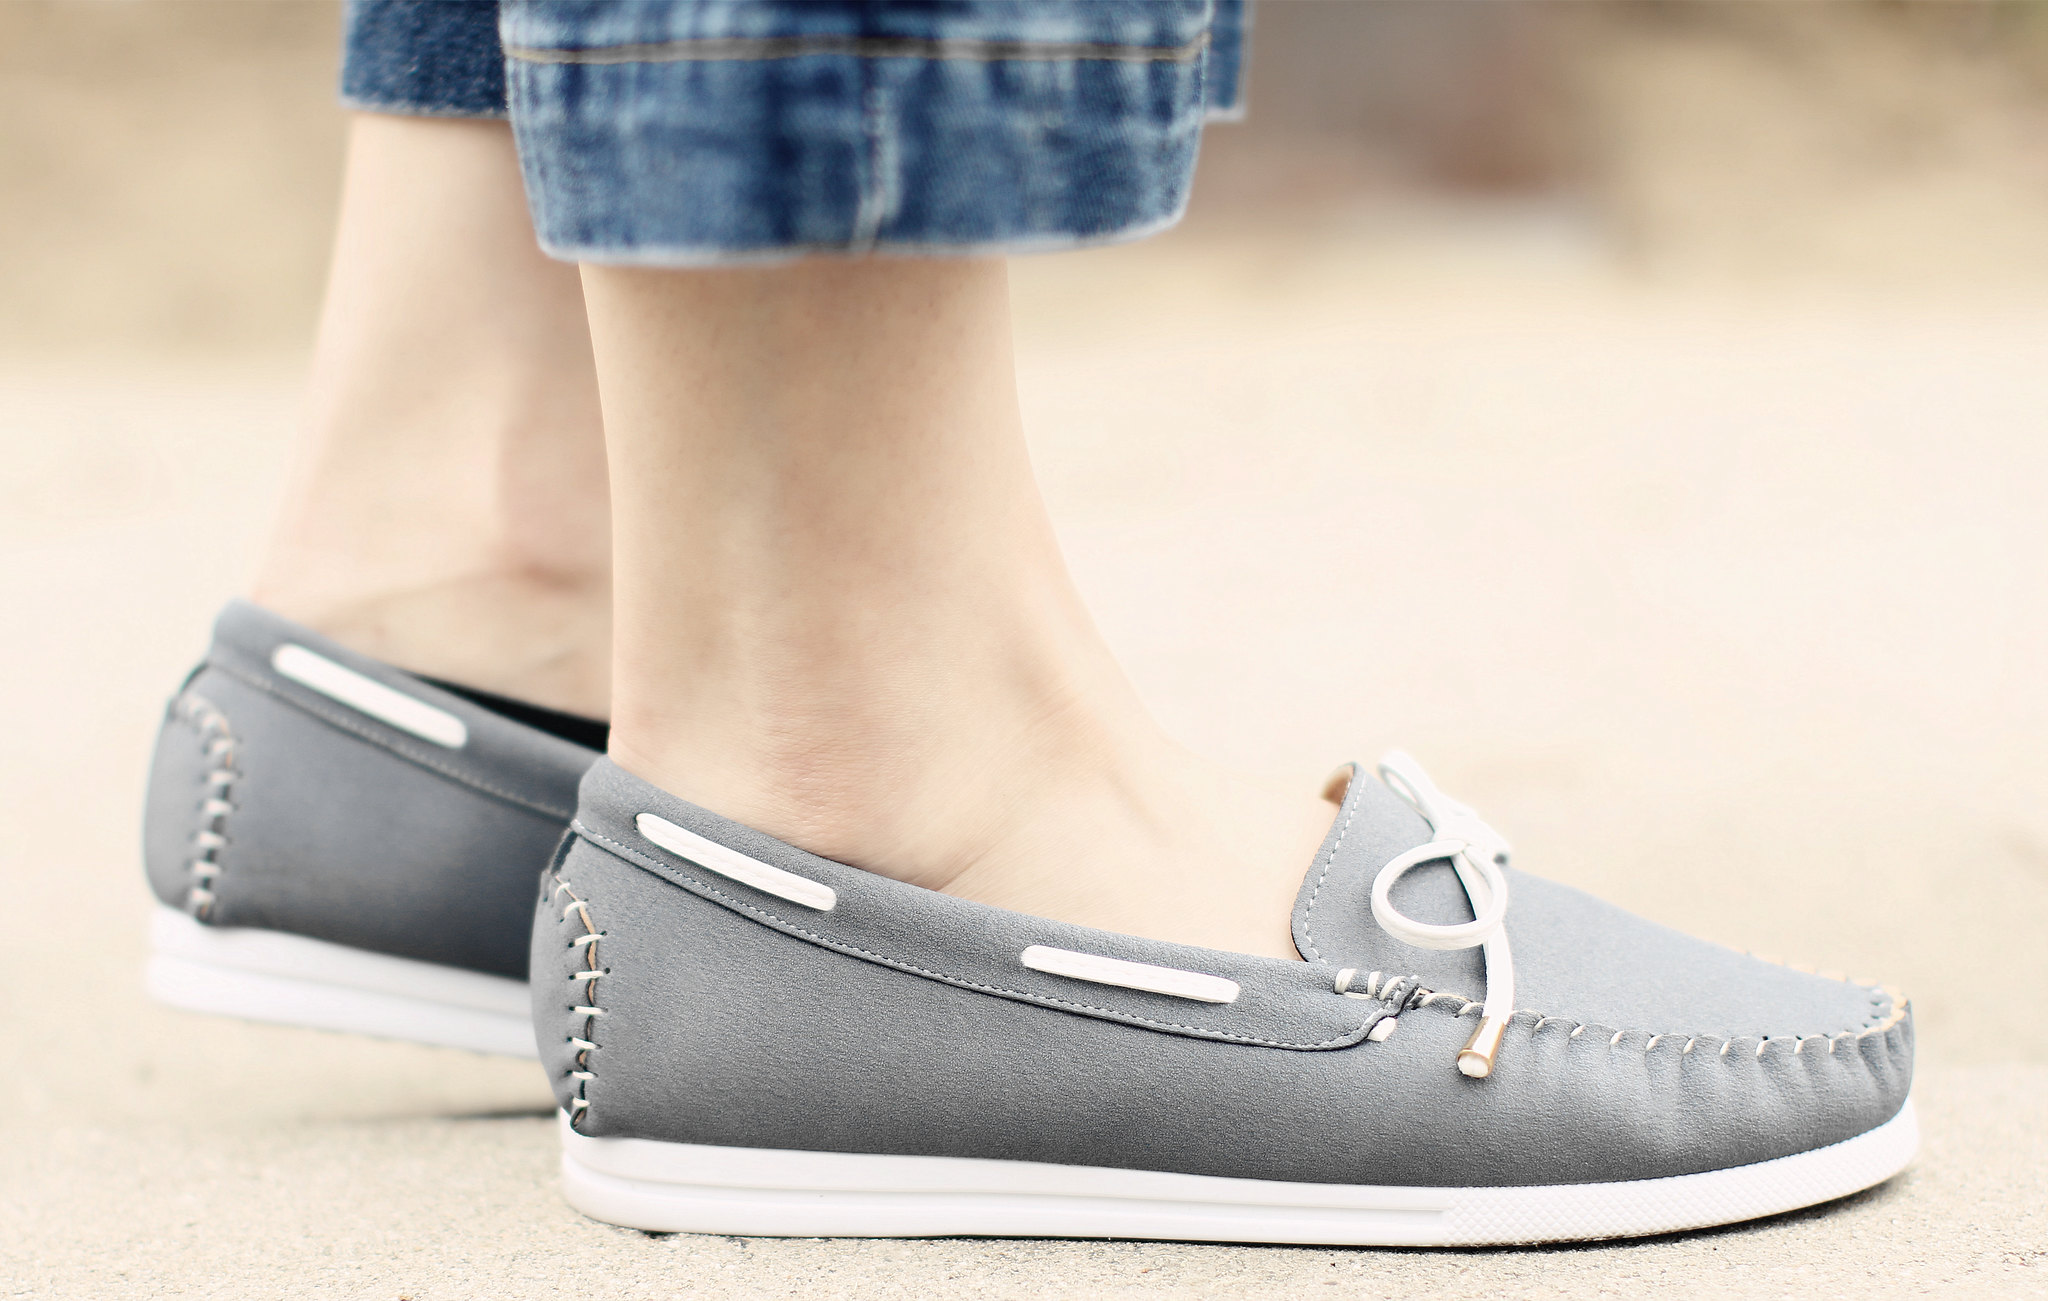 5096-ootd-fashion-style-outfitoftheday-wiwt-streetstyle-zara-f21xme-denim-thrifted-guess-koreanfashion-lookbook-elizabeeetht-clothestoyouuu